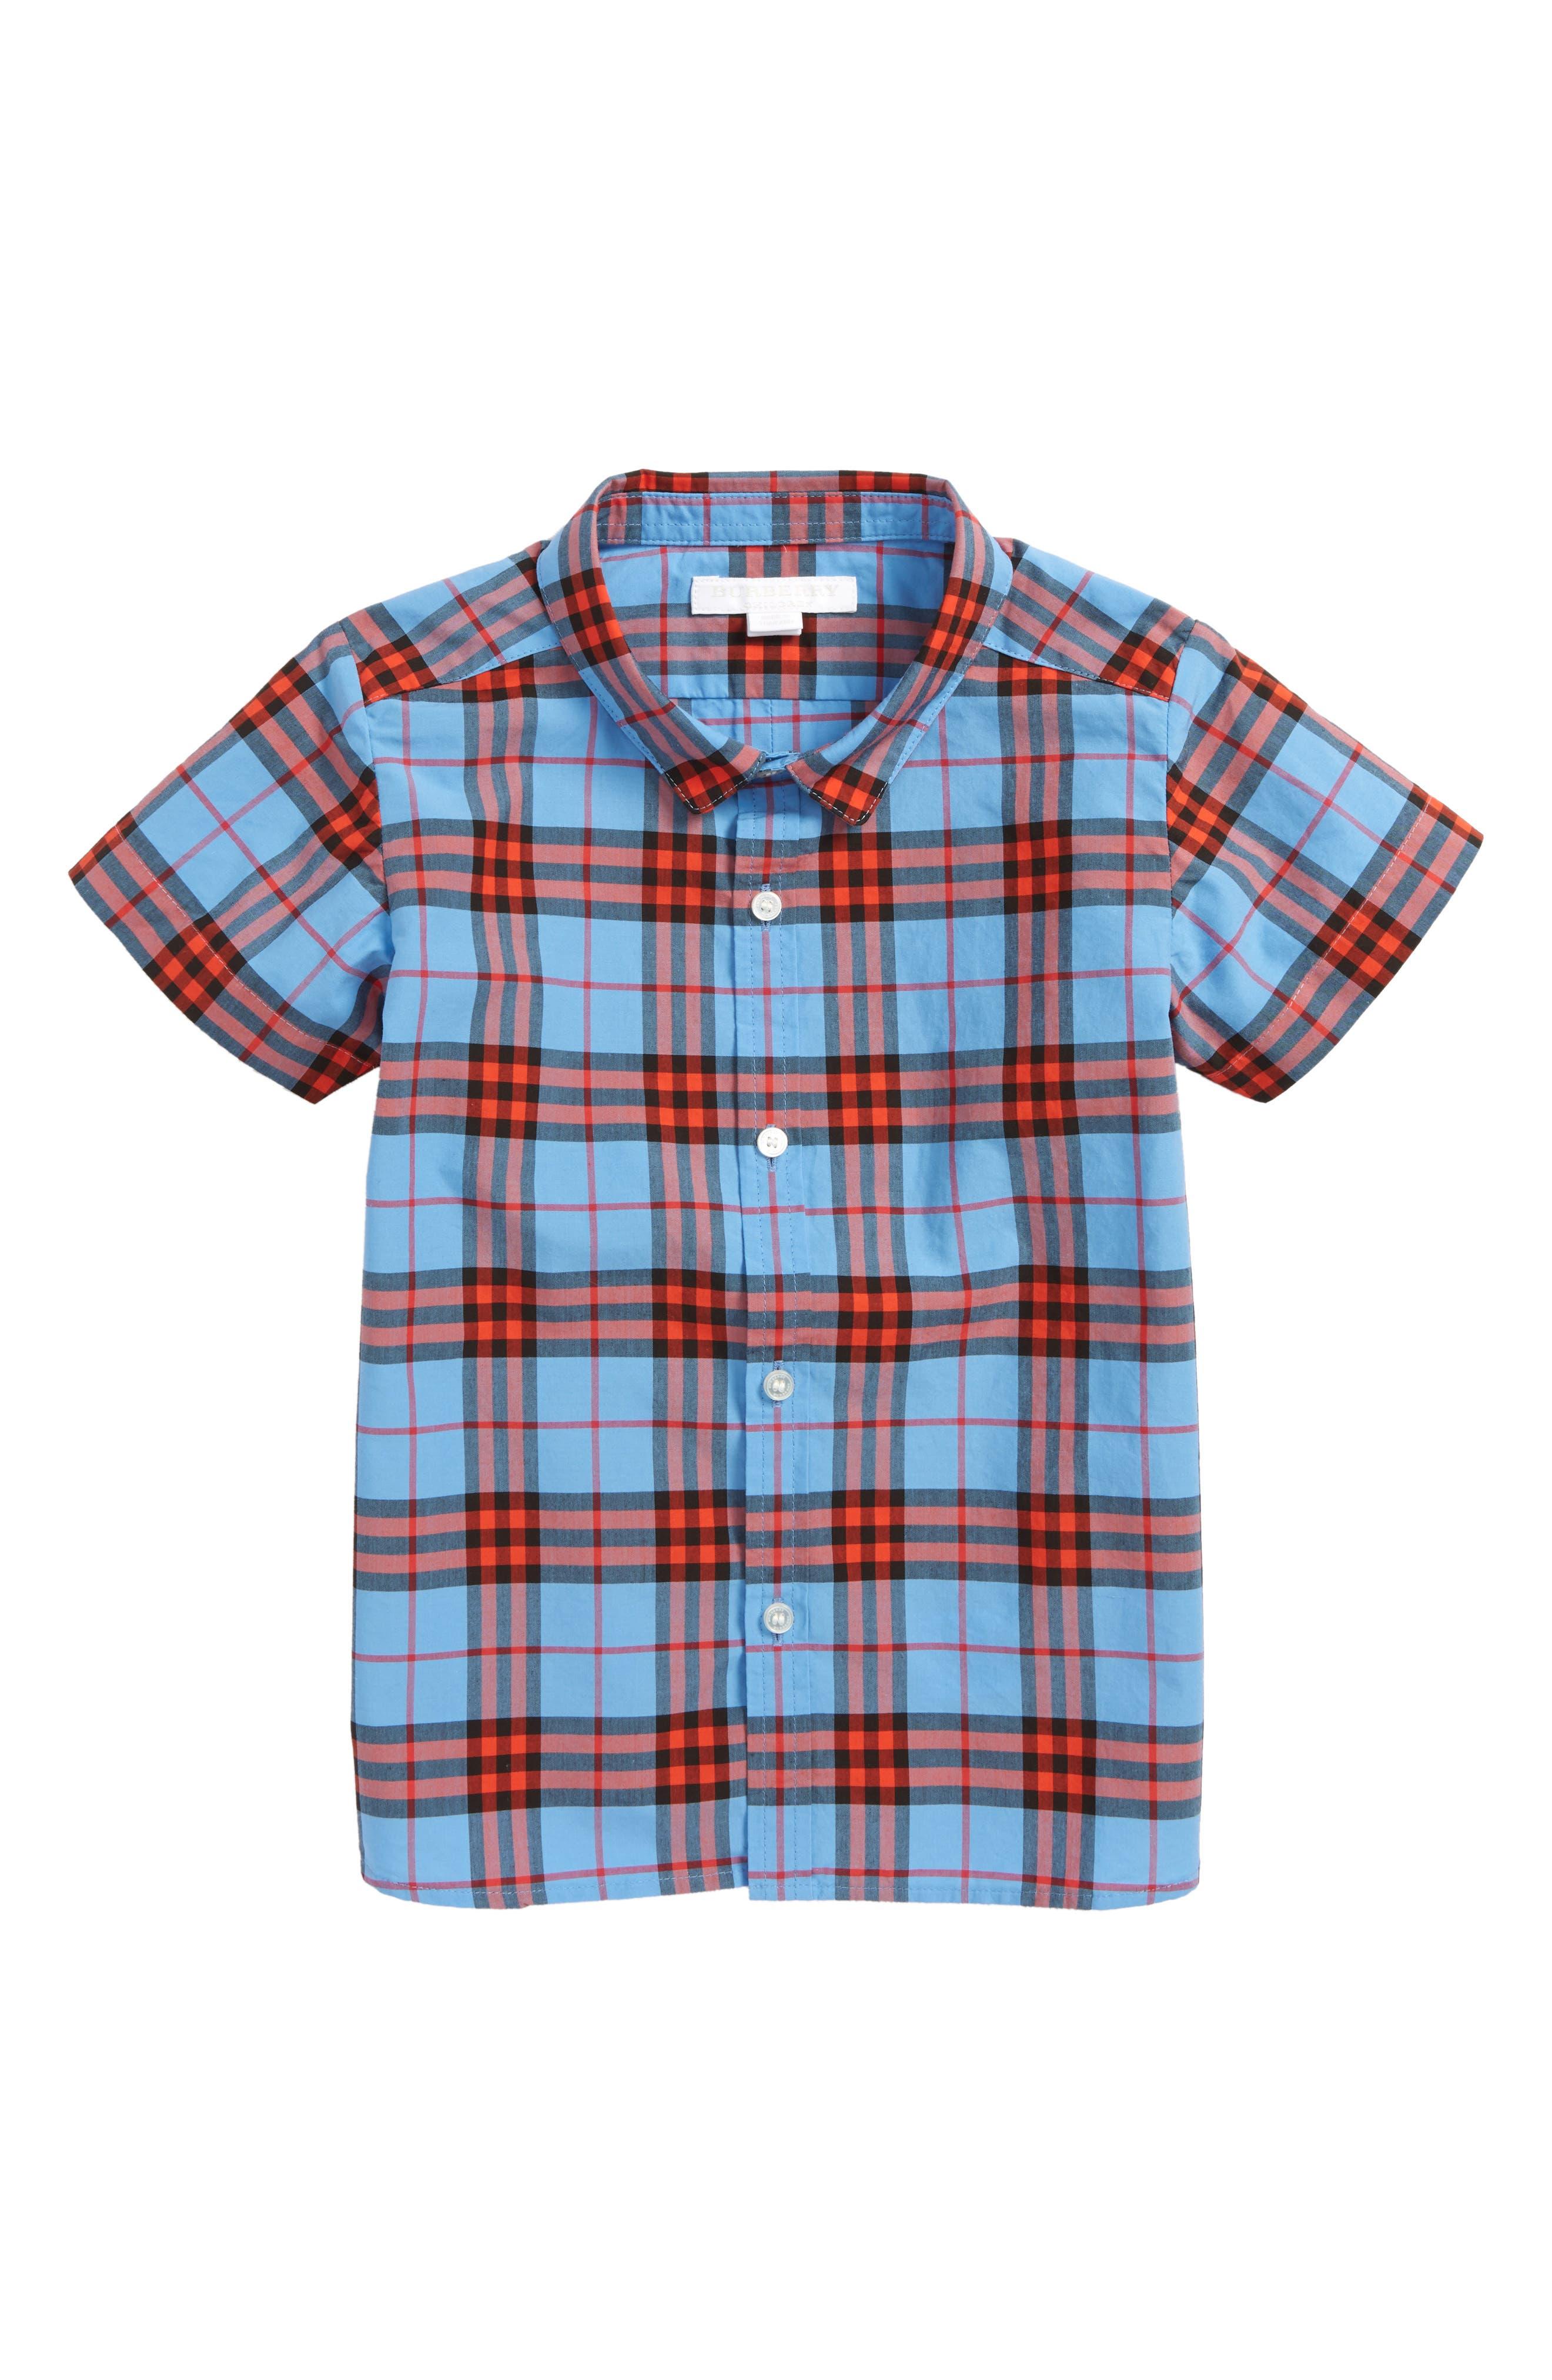 Clarkey Plaid Short Sleeve Shirt,                             Main thumbnail 1, color,                             CORNFLOWER BLUE